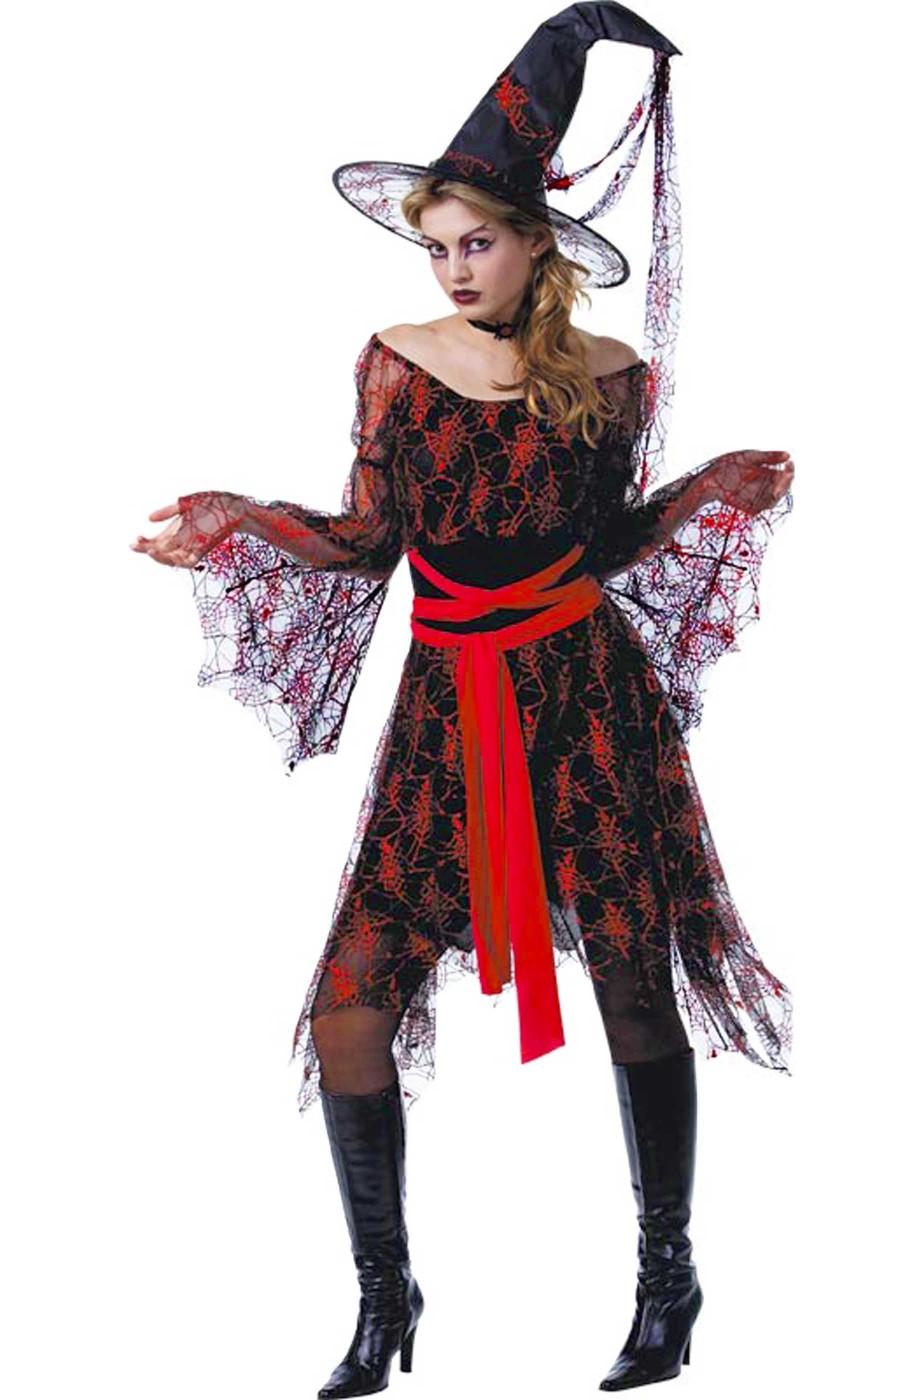 Vestiti Halloween Strega.Vestito Halloween Da Strega Donna Mille Veli Rossa Nera Bellissima